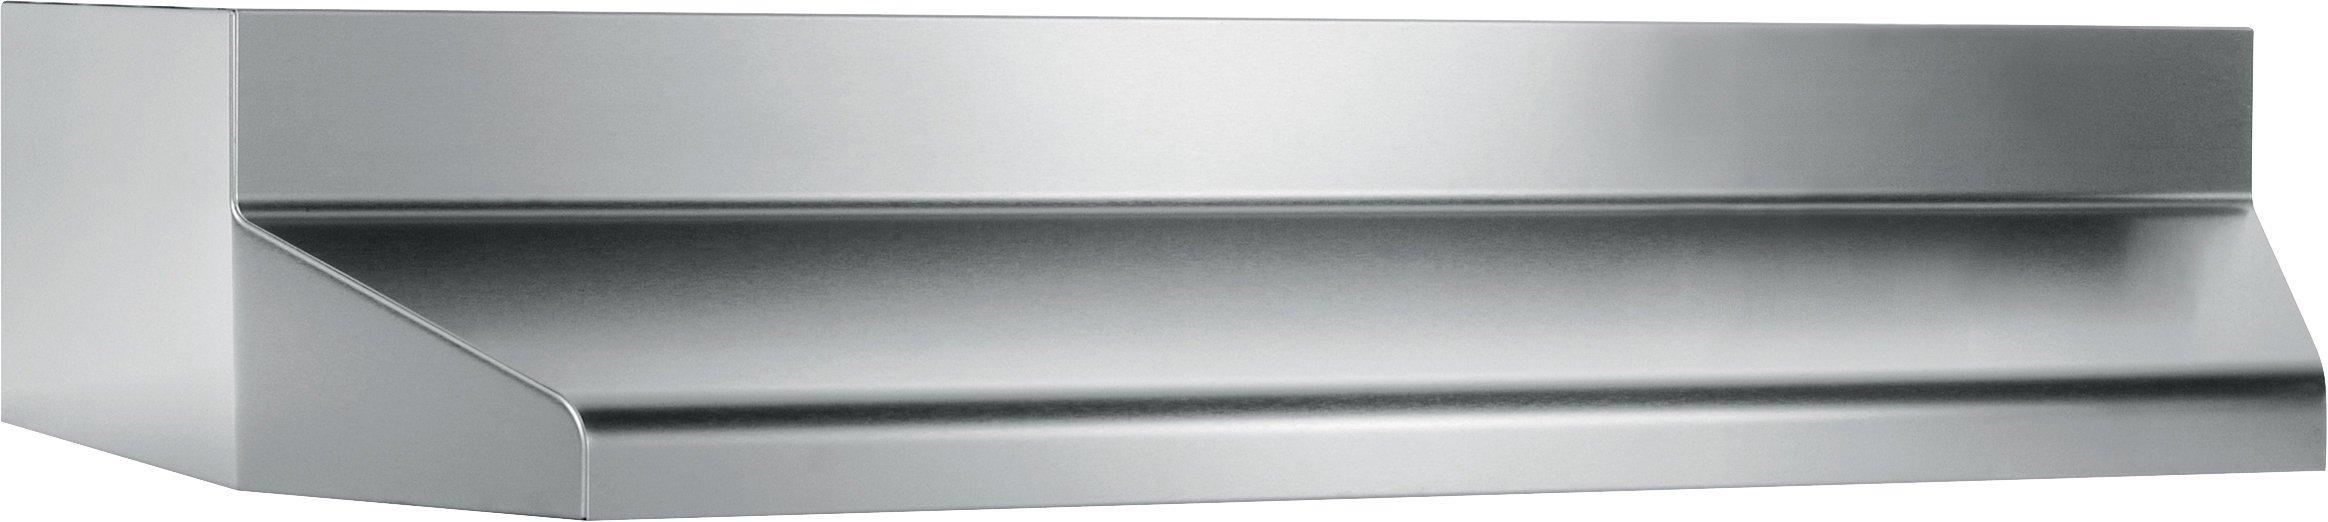 Broan 373004 30'' Stainless Steel Under Cabinet Range Hood Shell